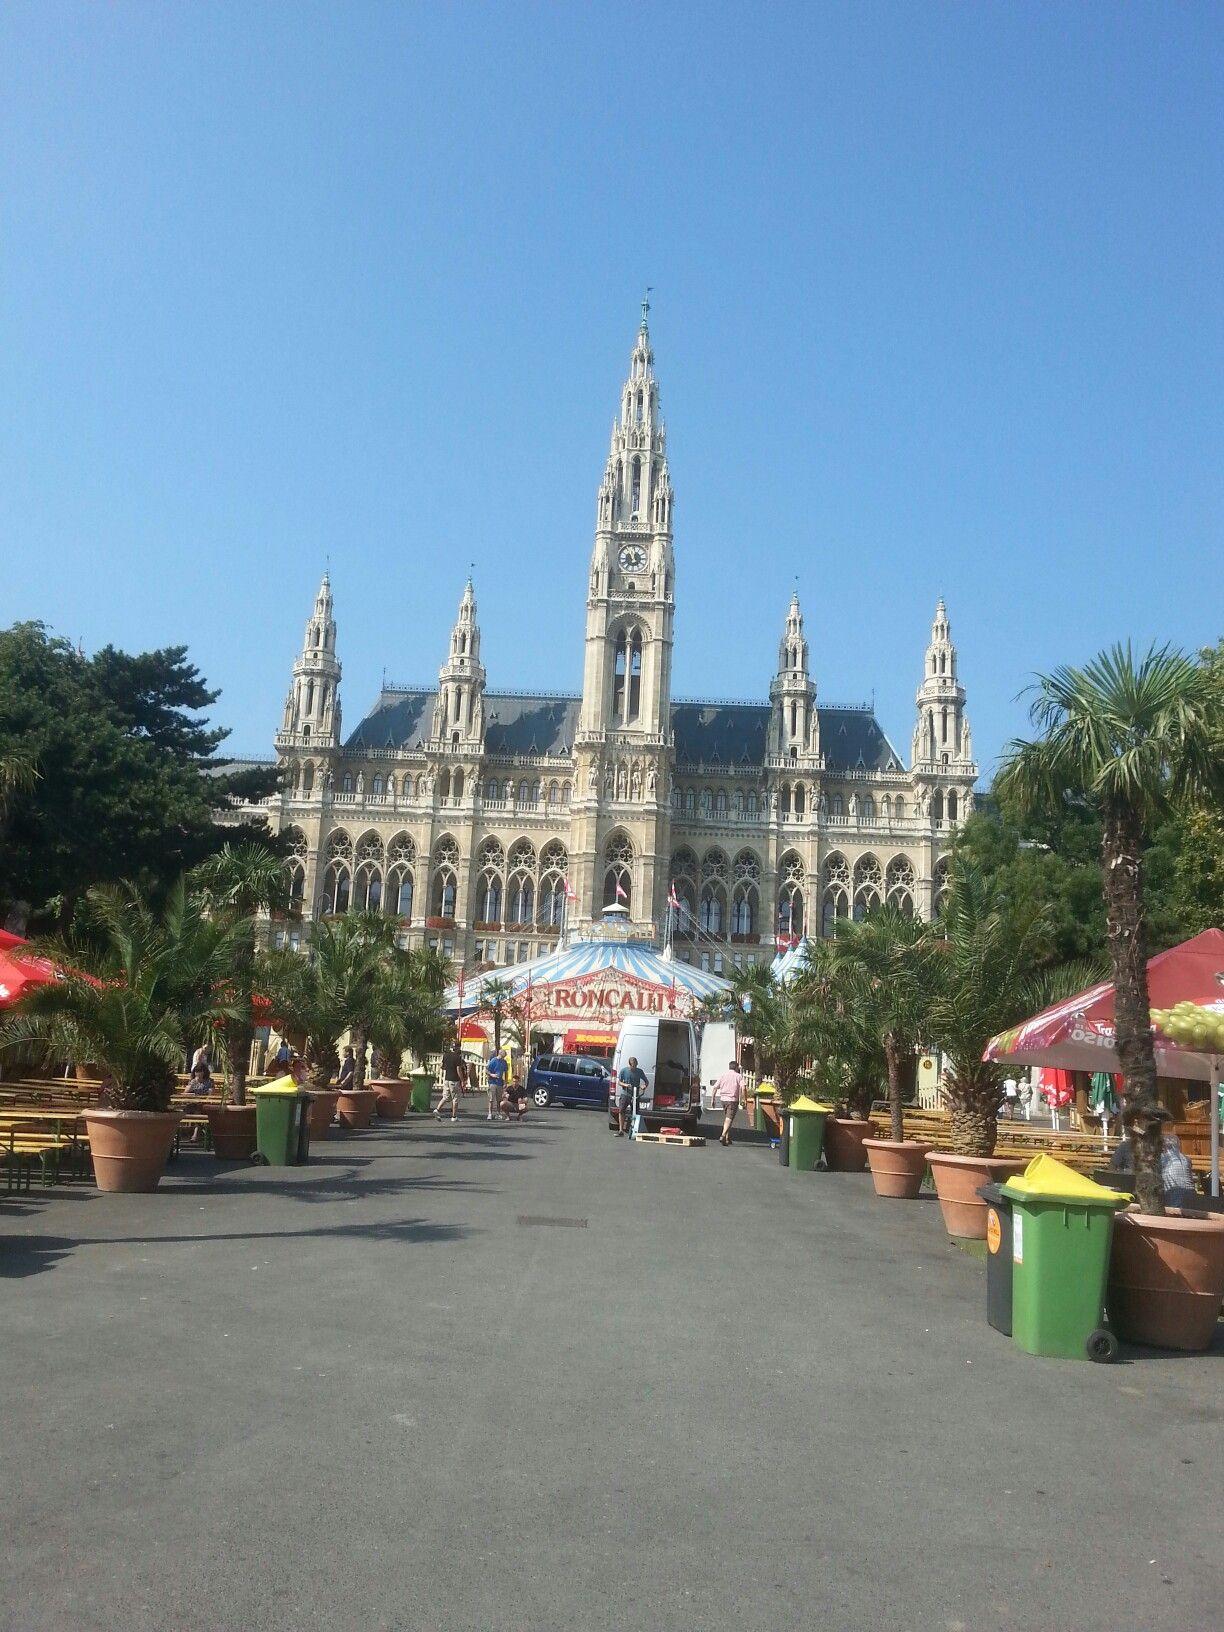 Vienna; Austria; 1010, Rathausplatz; Circus Roncalli